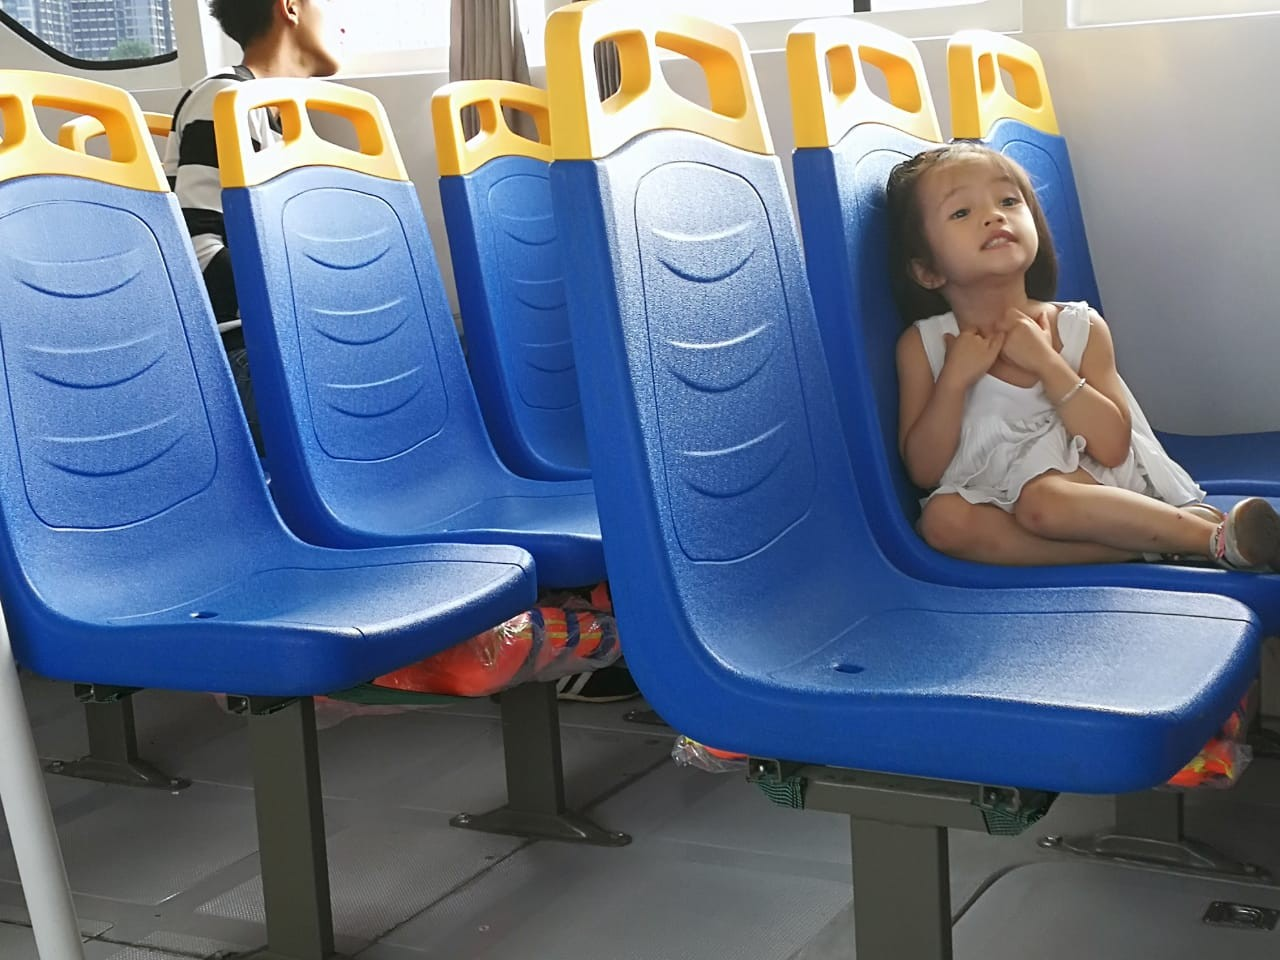 A young tourist enjoys 'me time' aboard the Saigon water bus.